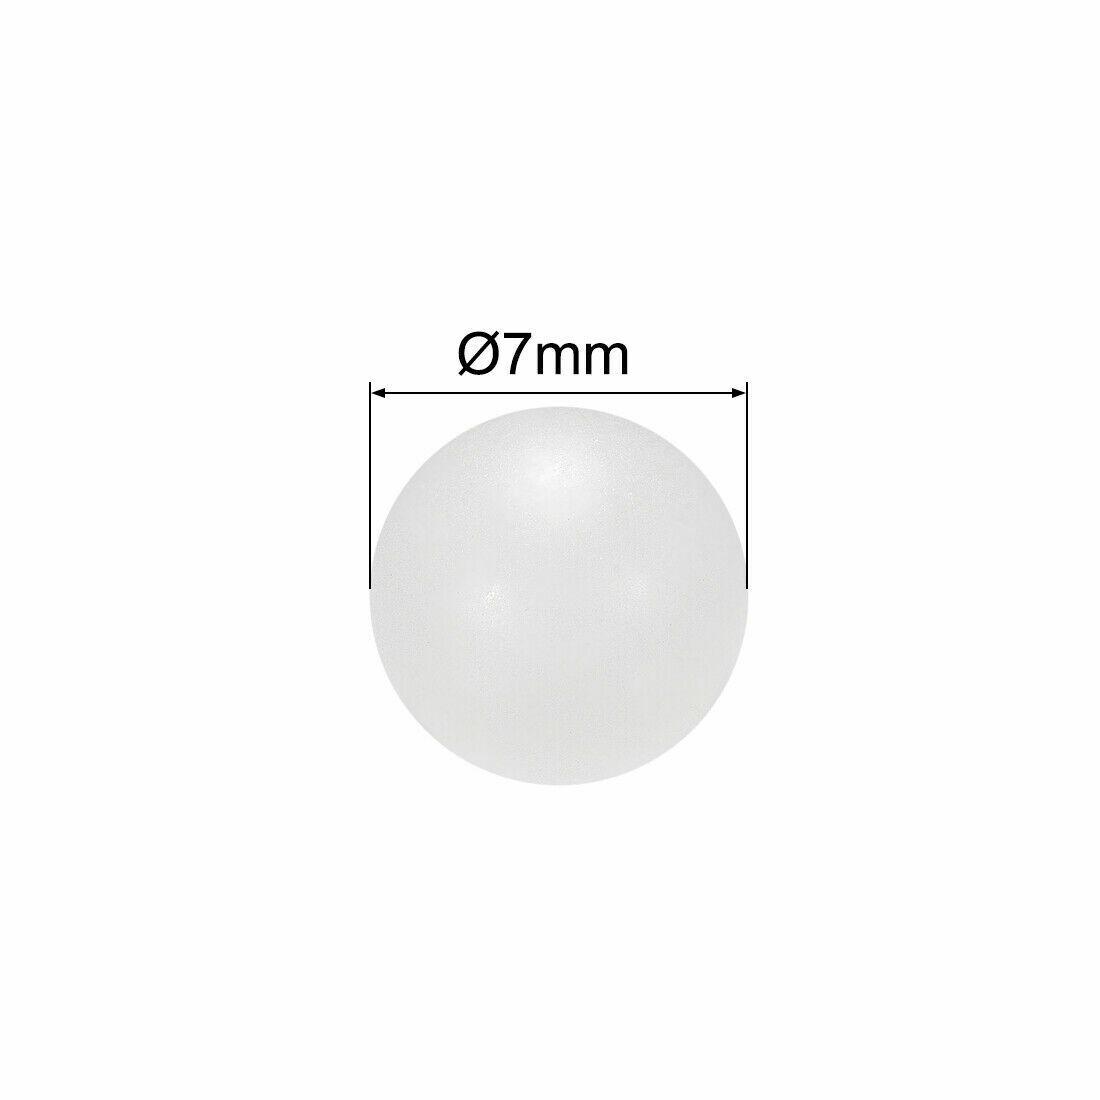 Precision Bearing Ball 1000pcs 7mm PP Solid Plastic Balls